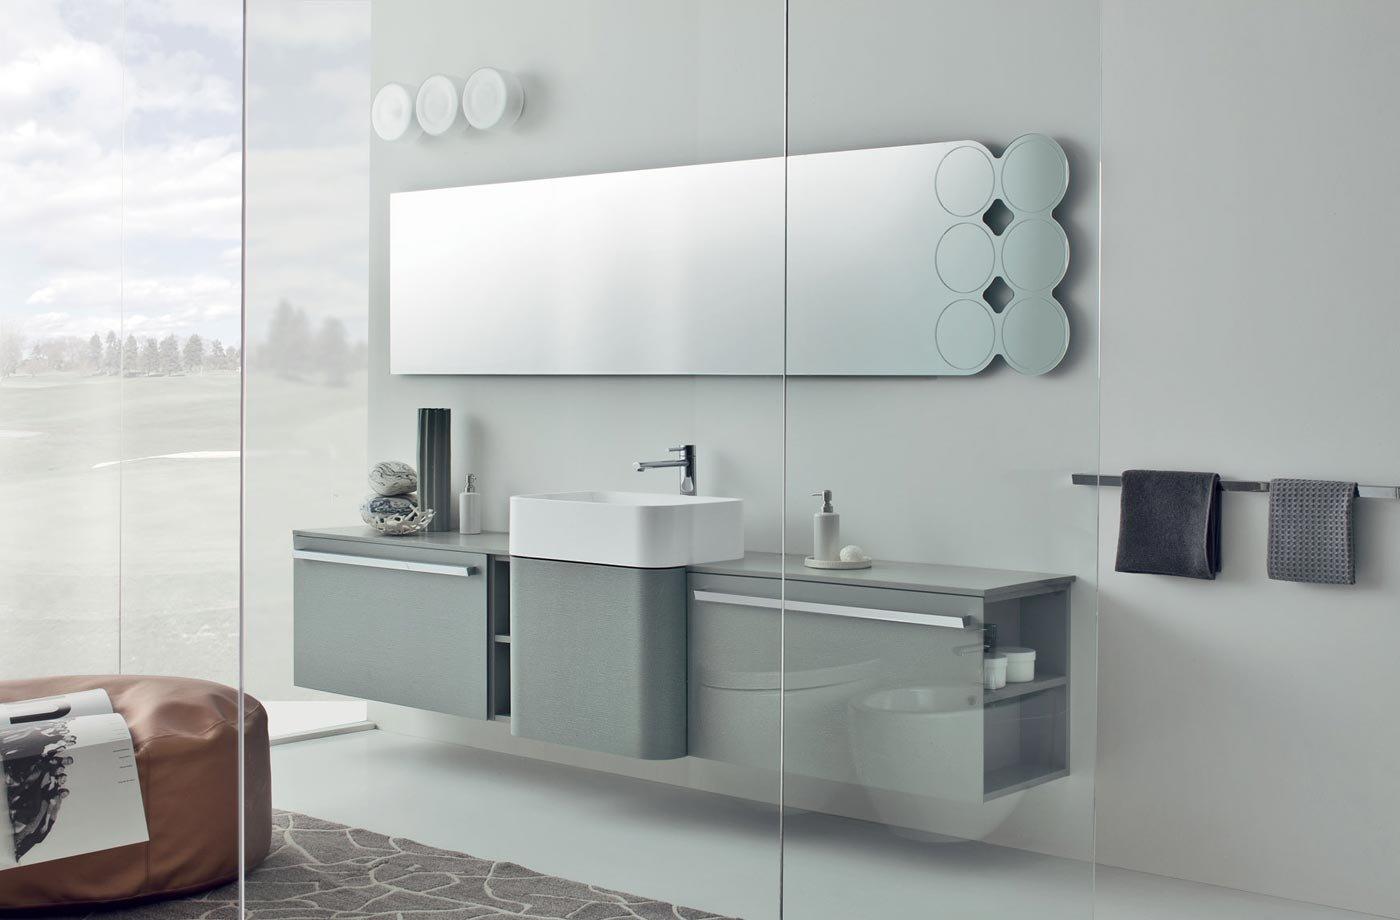 Lavabos de dise o moderno de la firma altamarea for Muebles de lavabo modernos